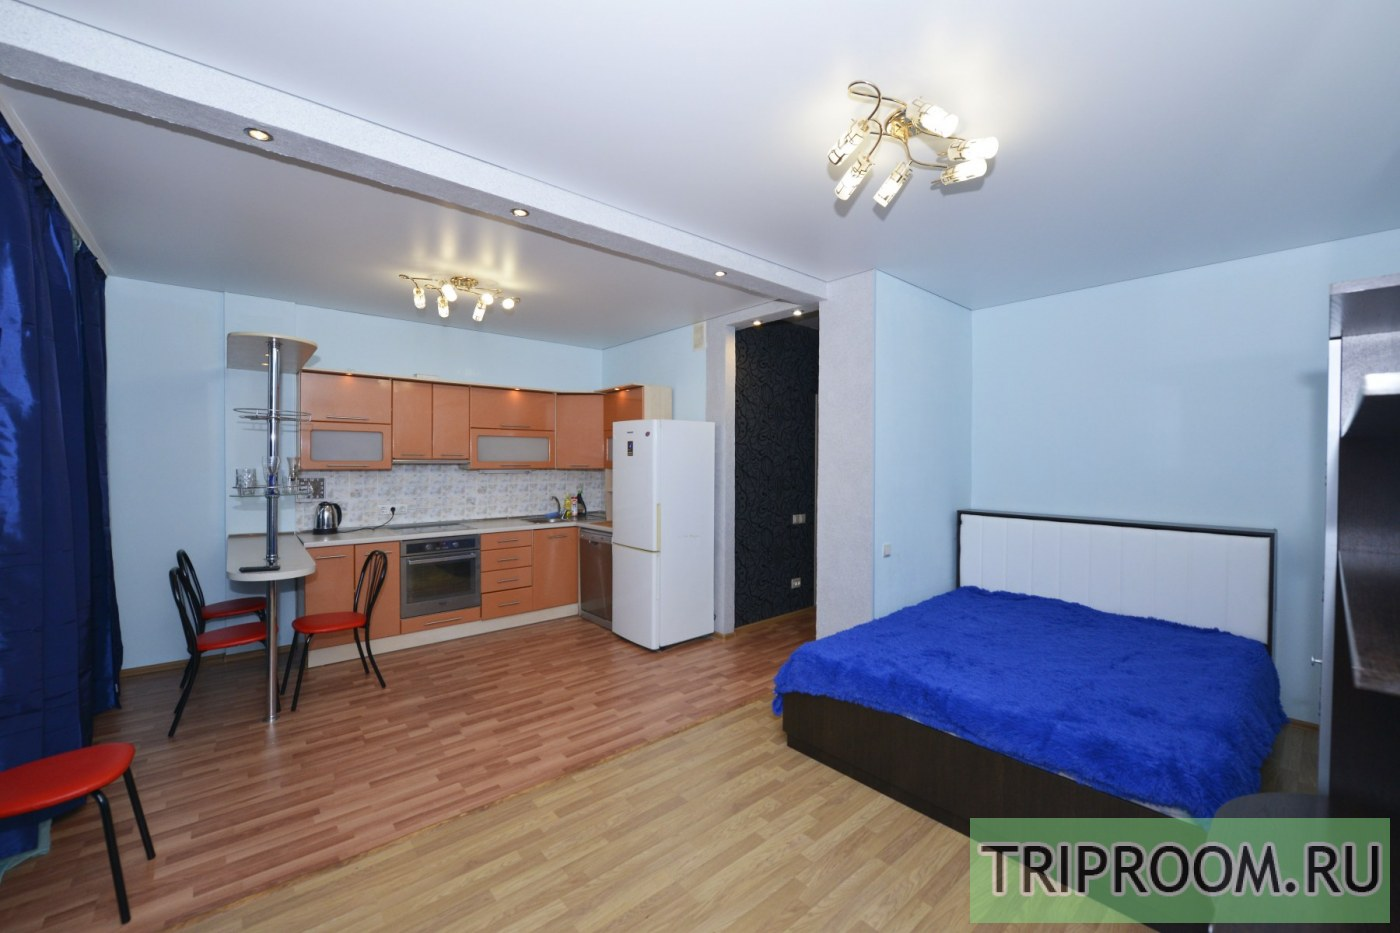 1-комнатная квартира посуточно (вариант № 40607), ул. Галущака улица, фото № 5